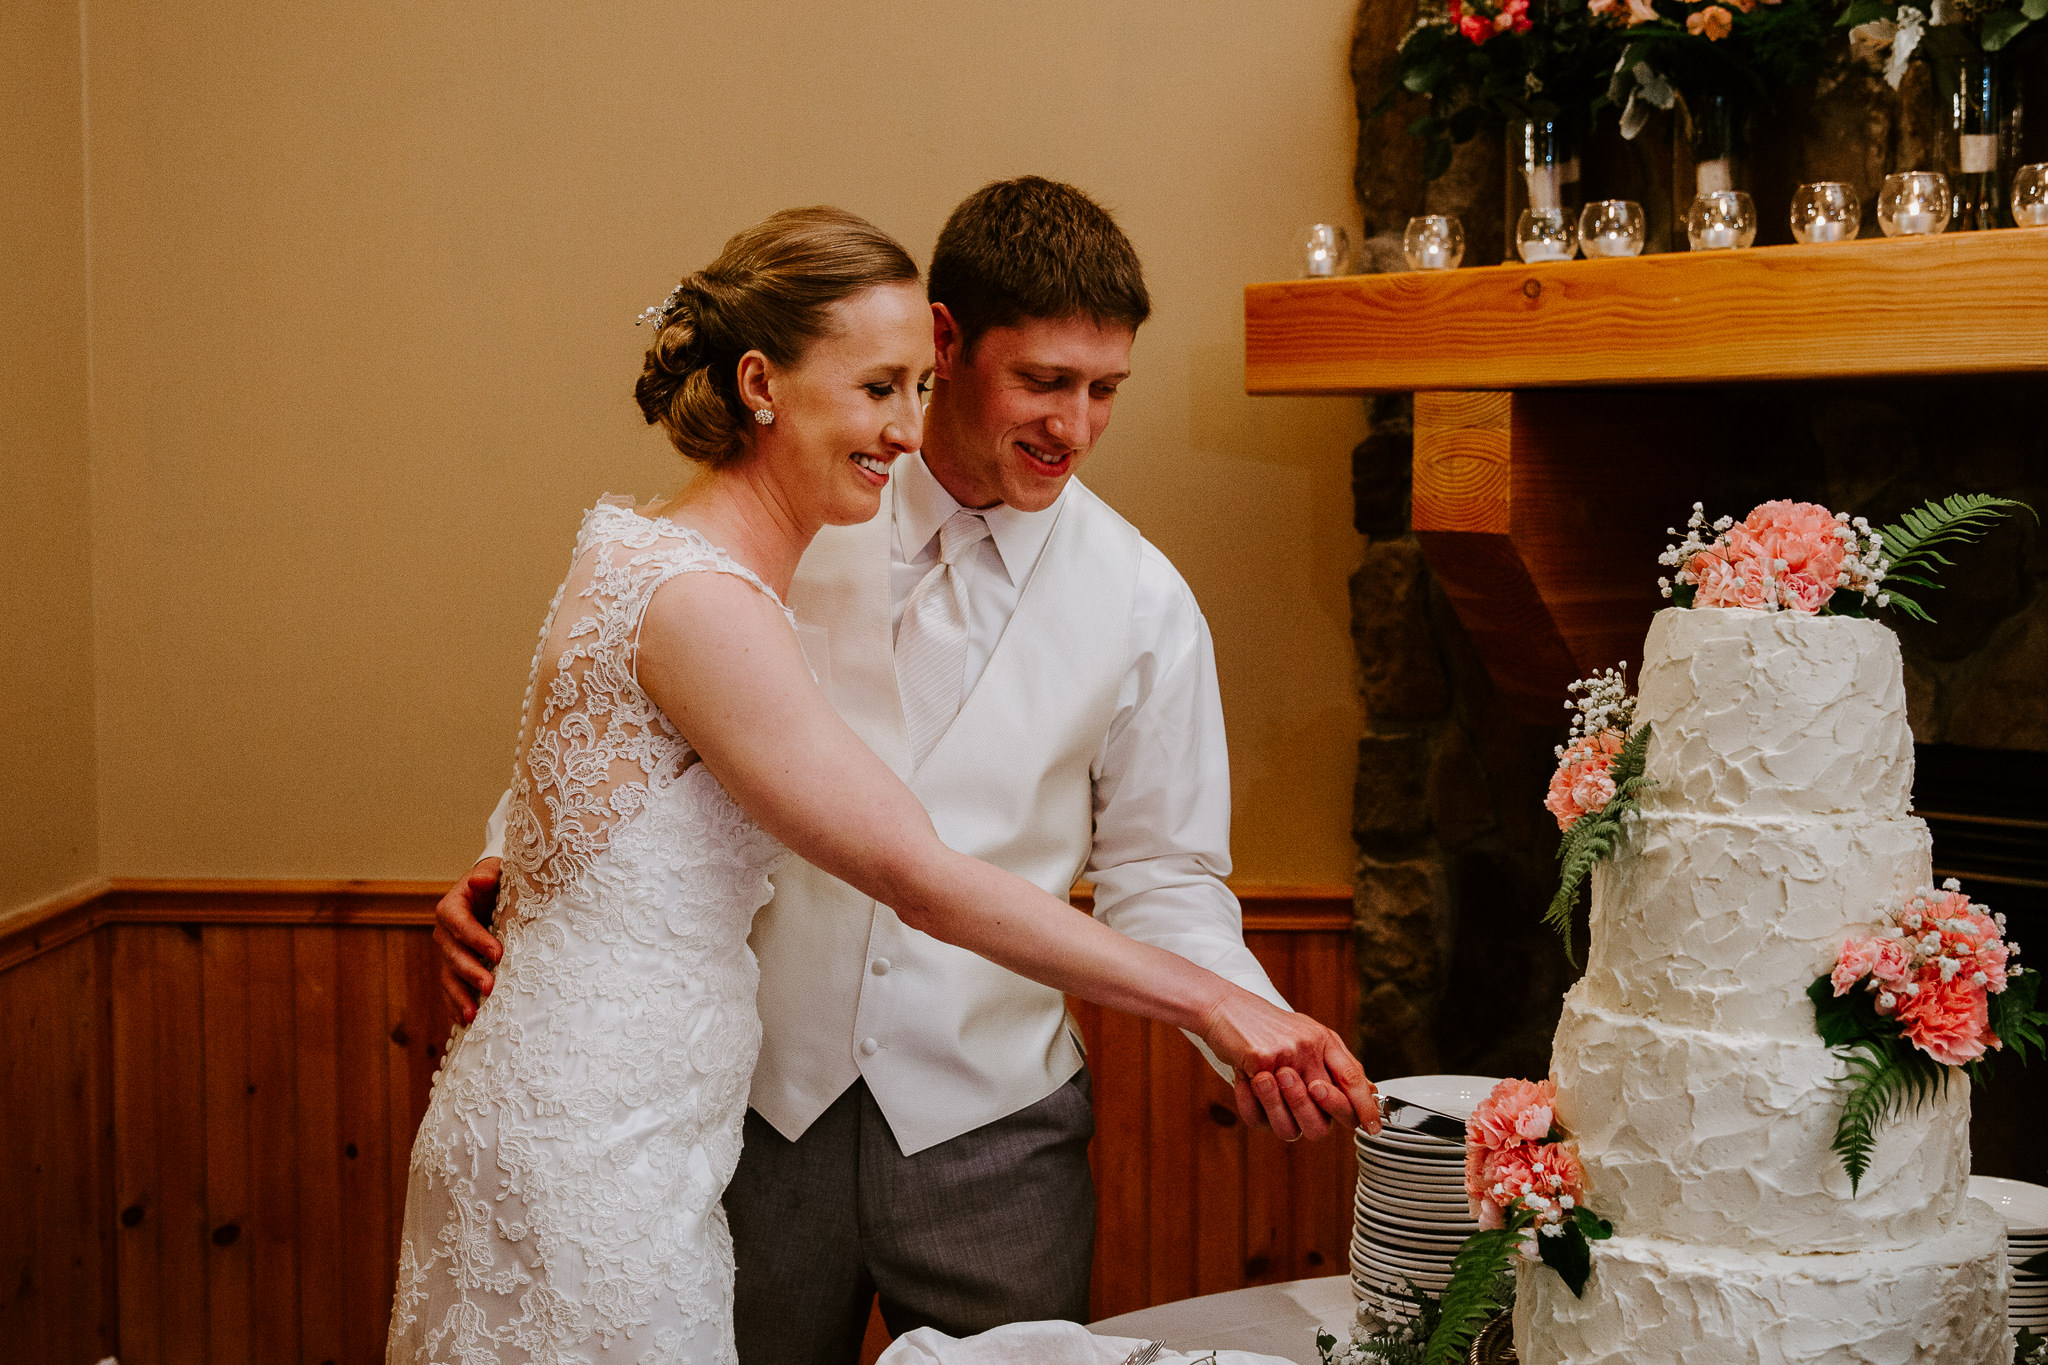 House Mountain Inn - Weddings - Lexington - Virginia - Best Wedding Photographer - Pat Cori Photography-75.jpg